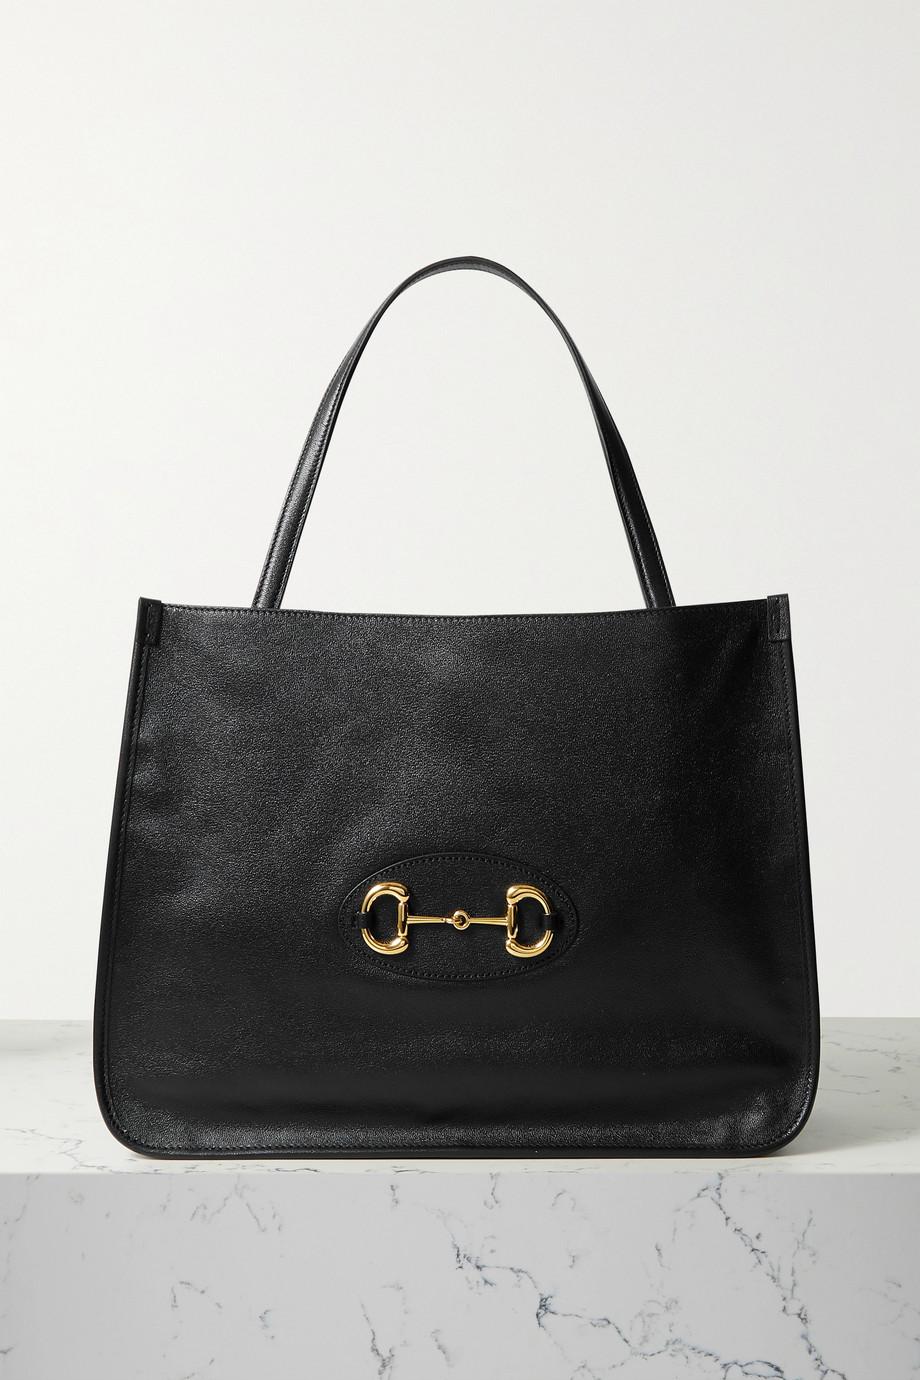 Gucci 1955 medium horsebit-detailed leather tote